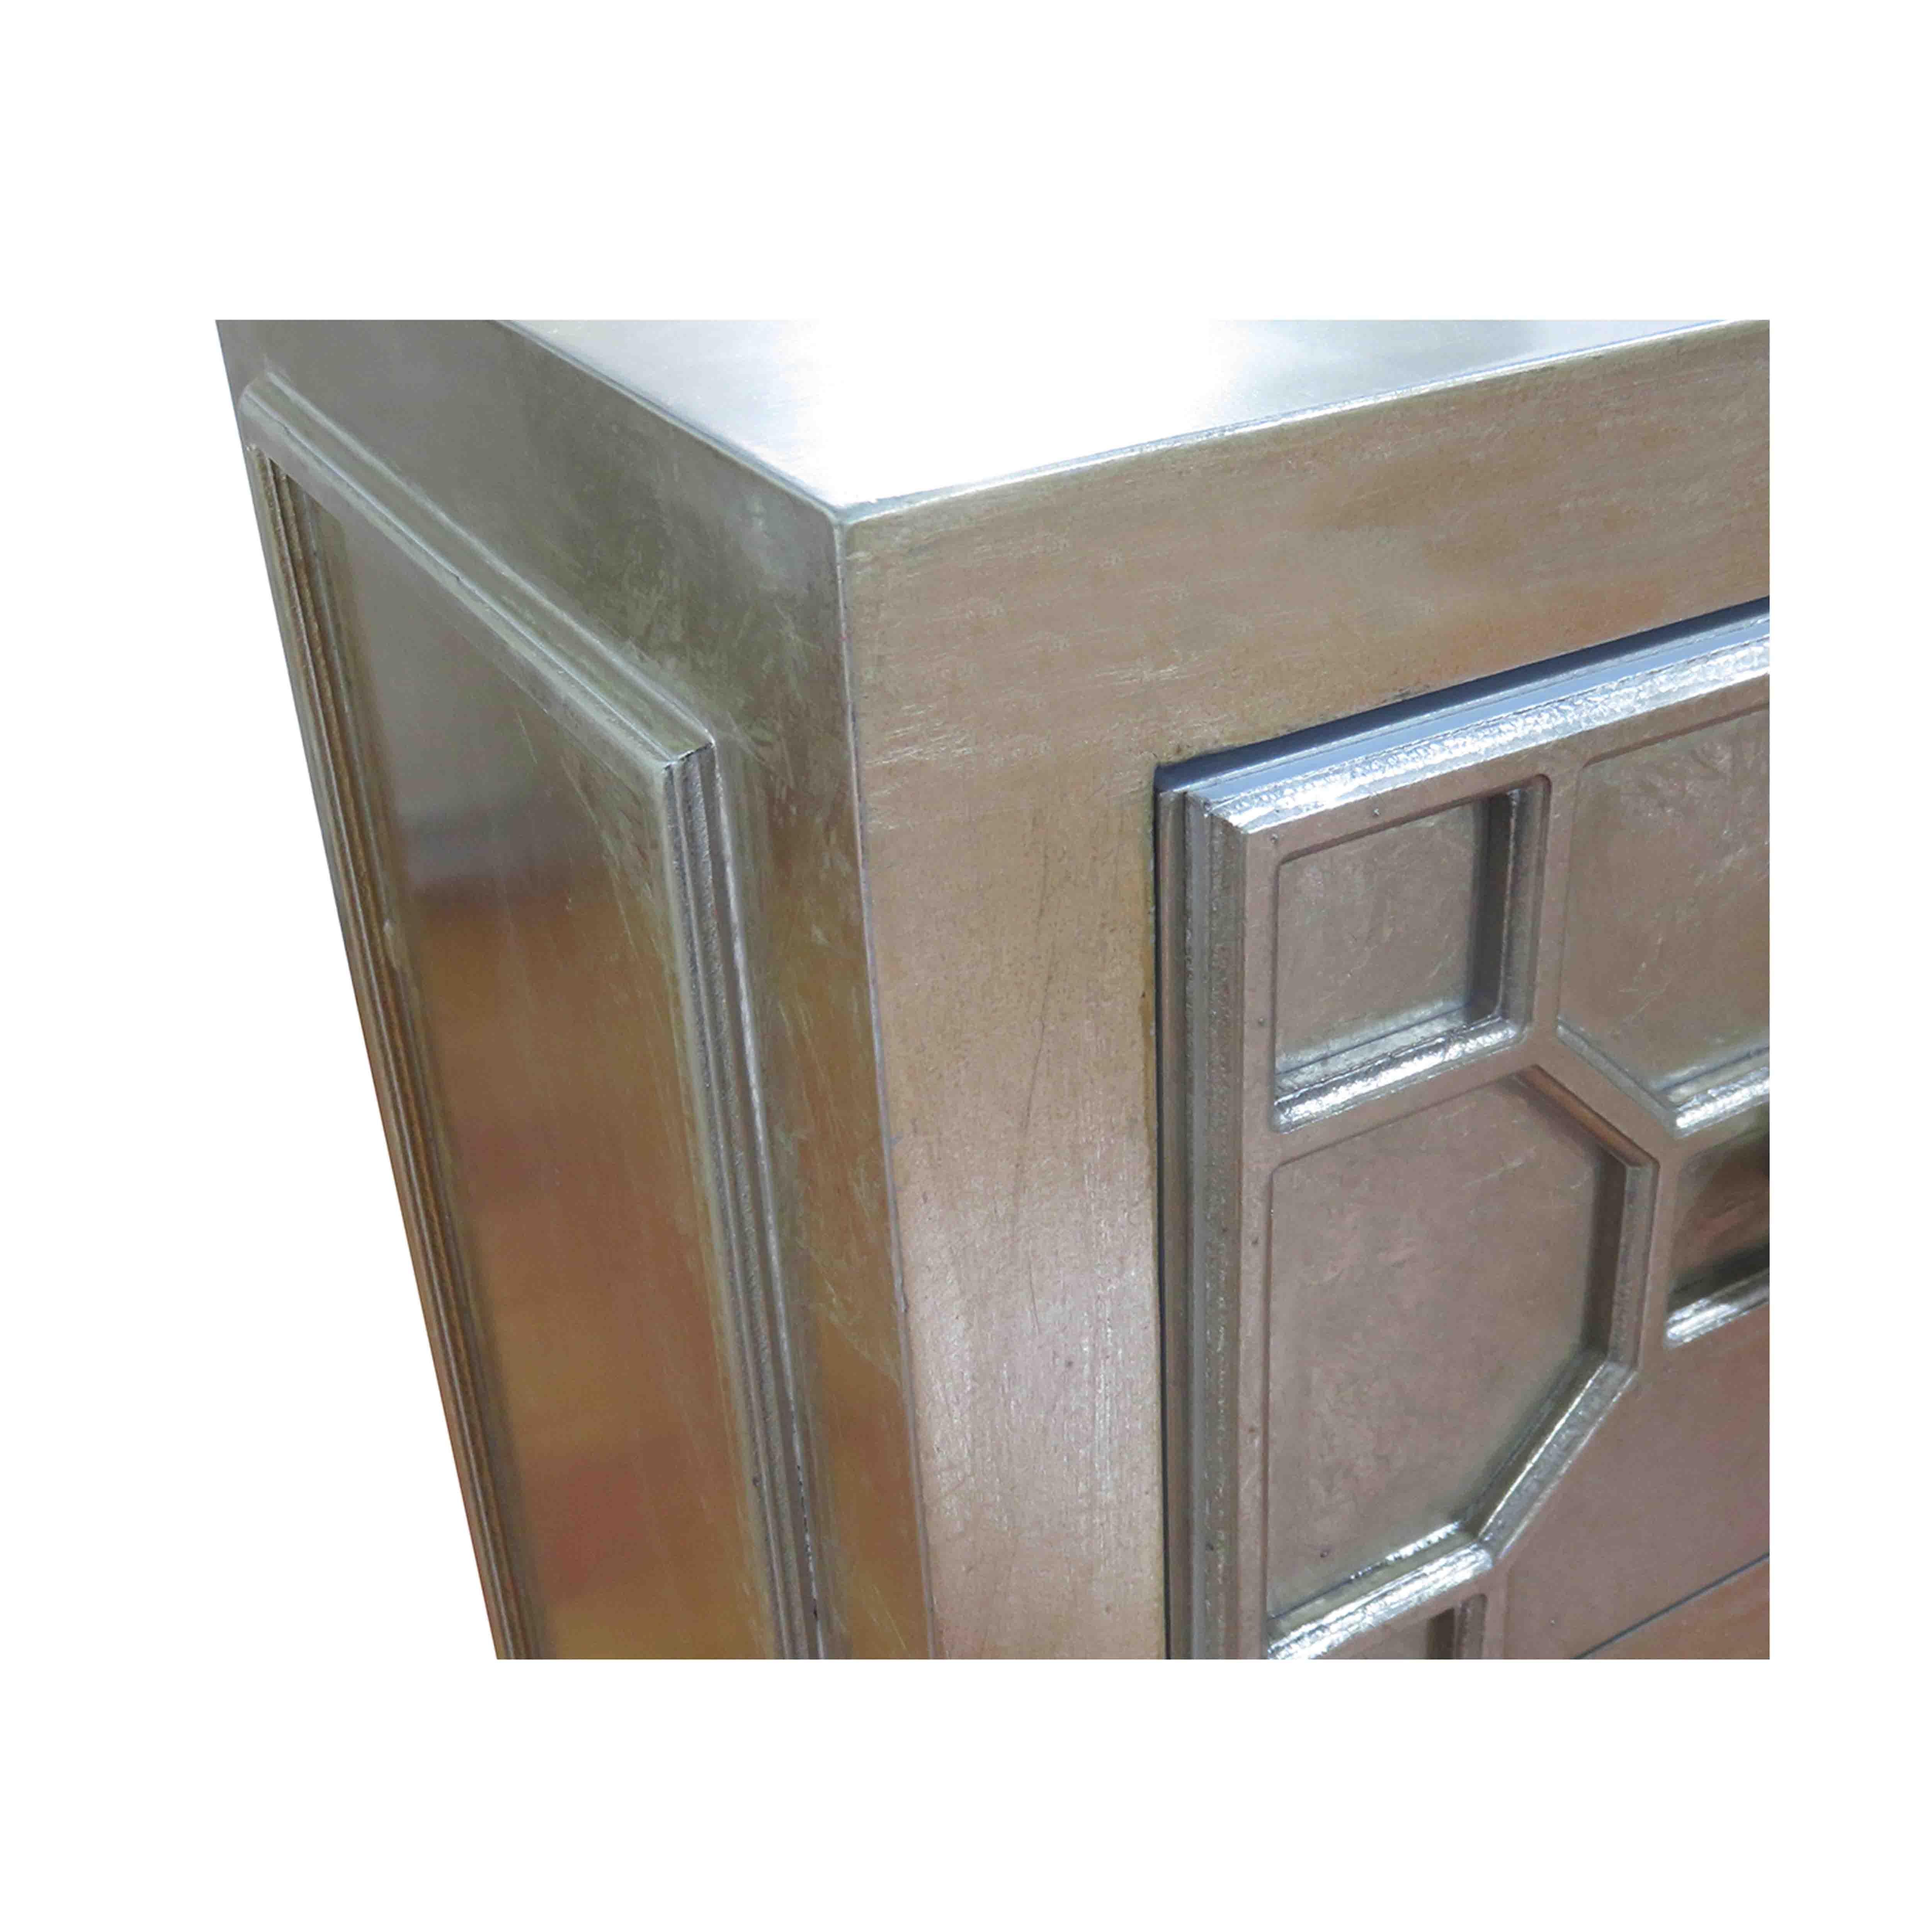 2100005 Ac Npd Furniture Wholesale Lifestyle Furniture